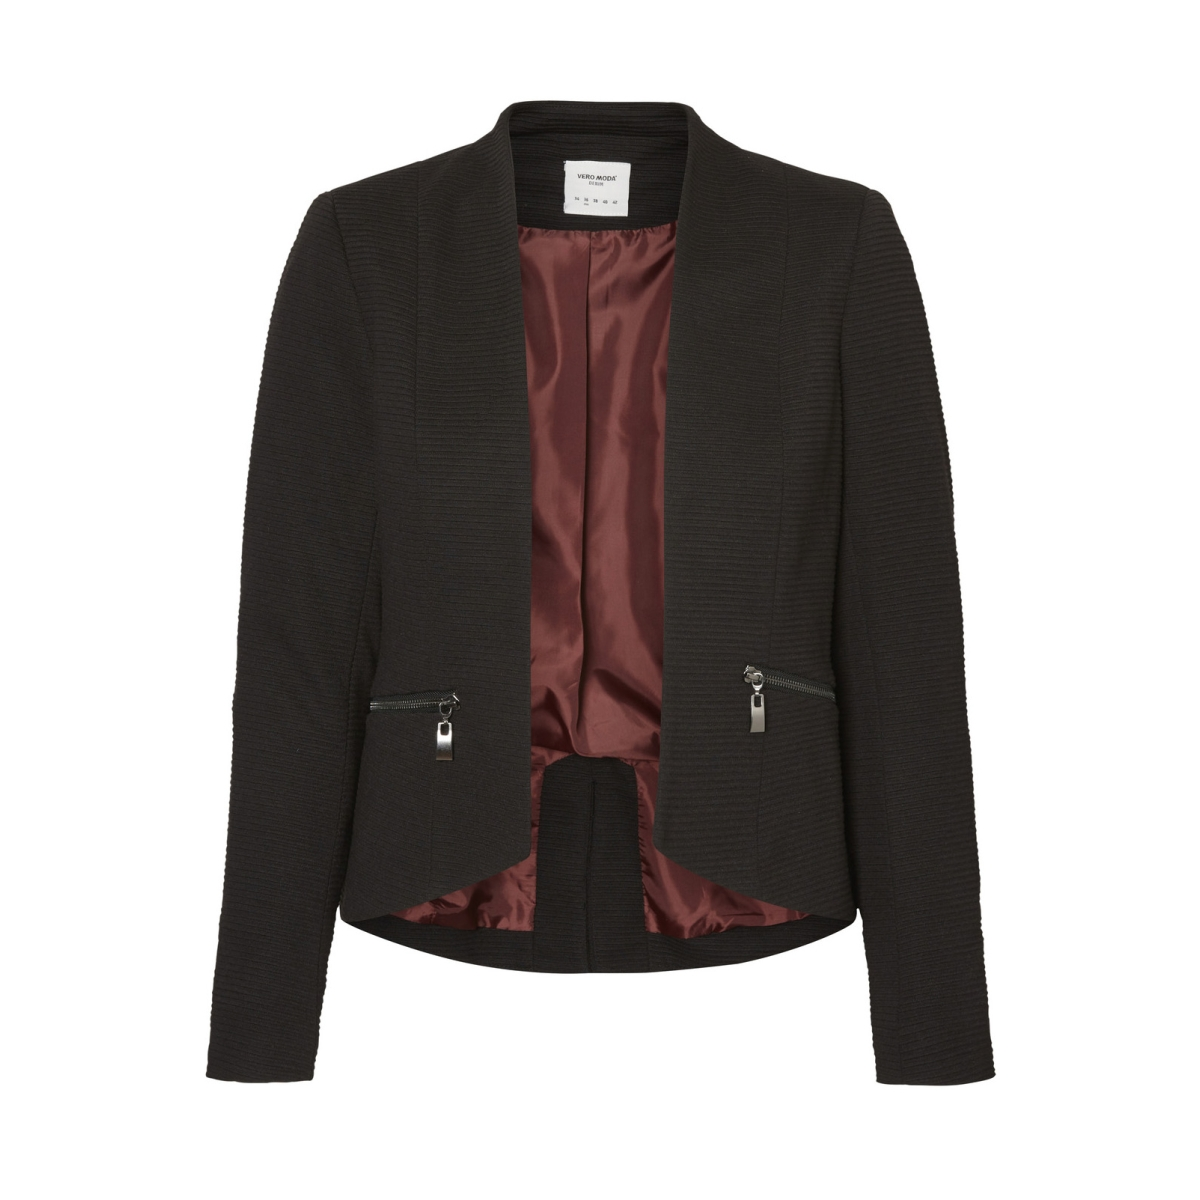 vmmajay l/s short blazer dnm rep 10191155 vero moda blazer black/ lining